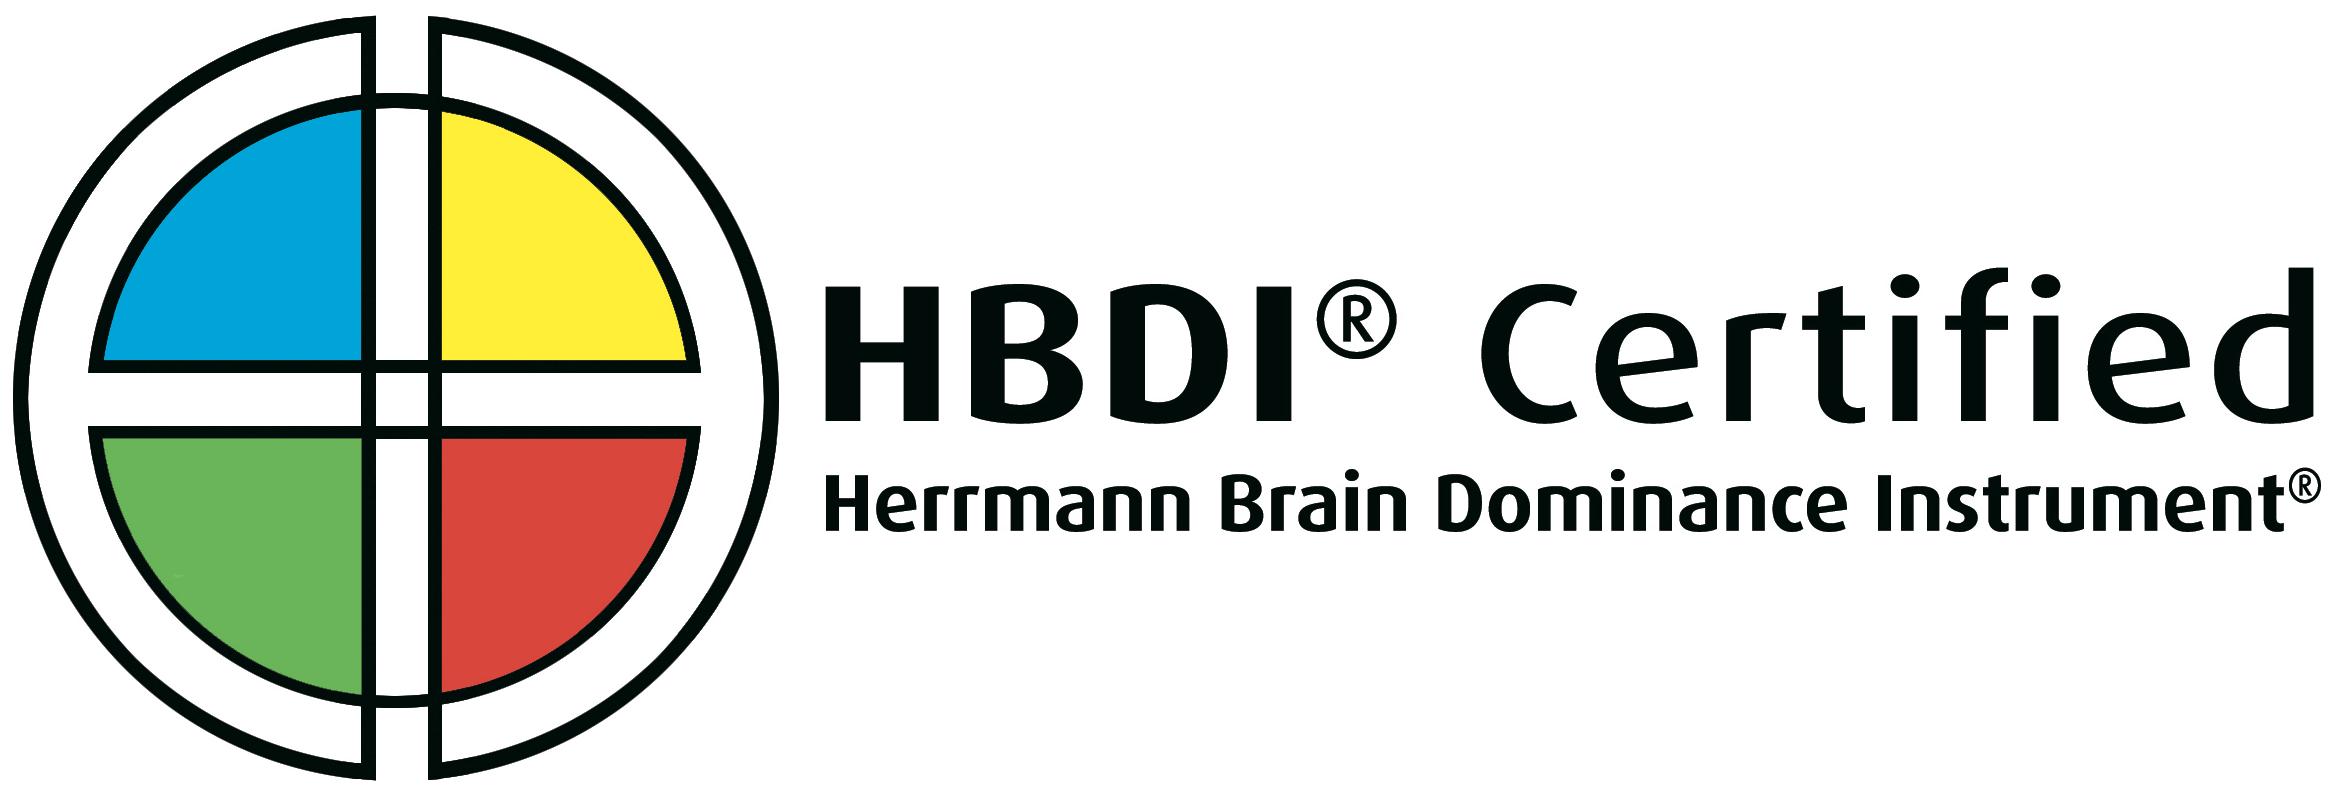 HBDIlogo.png